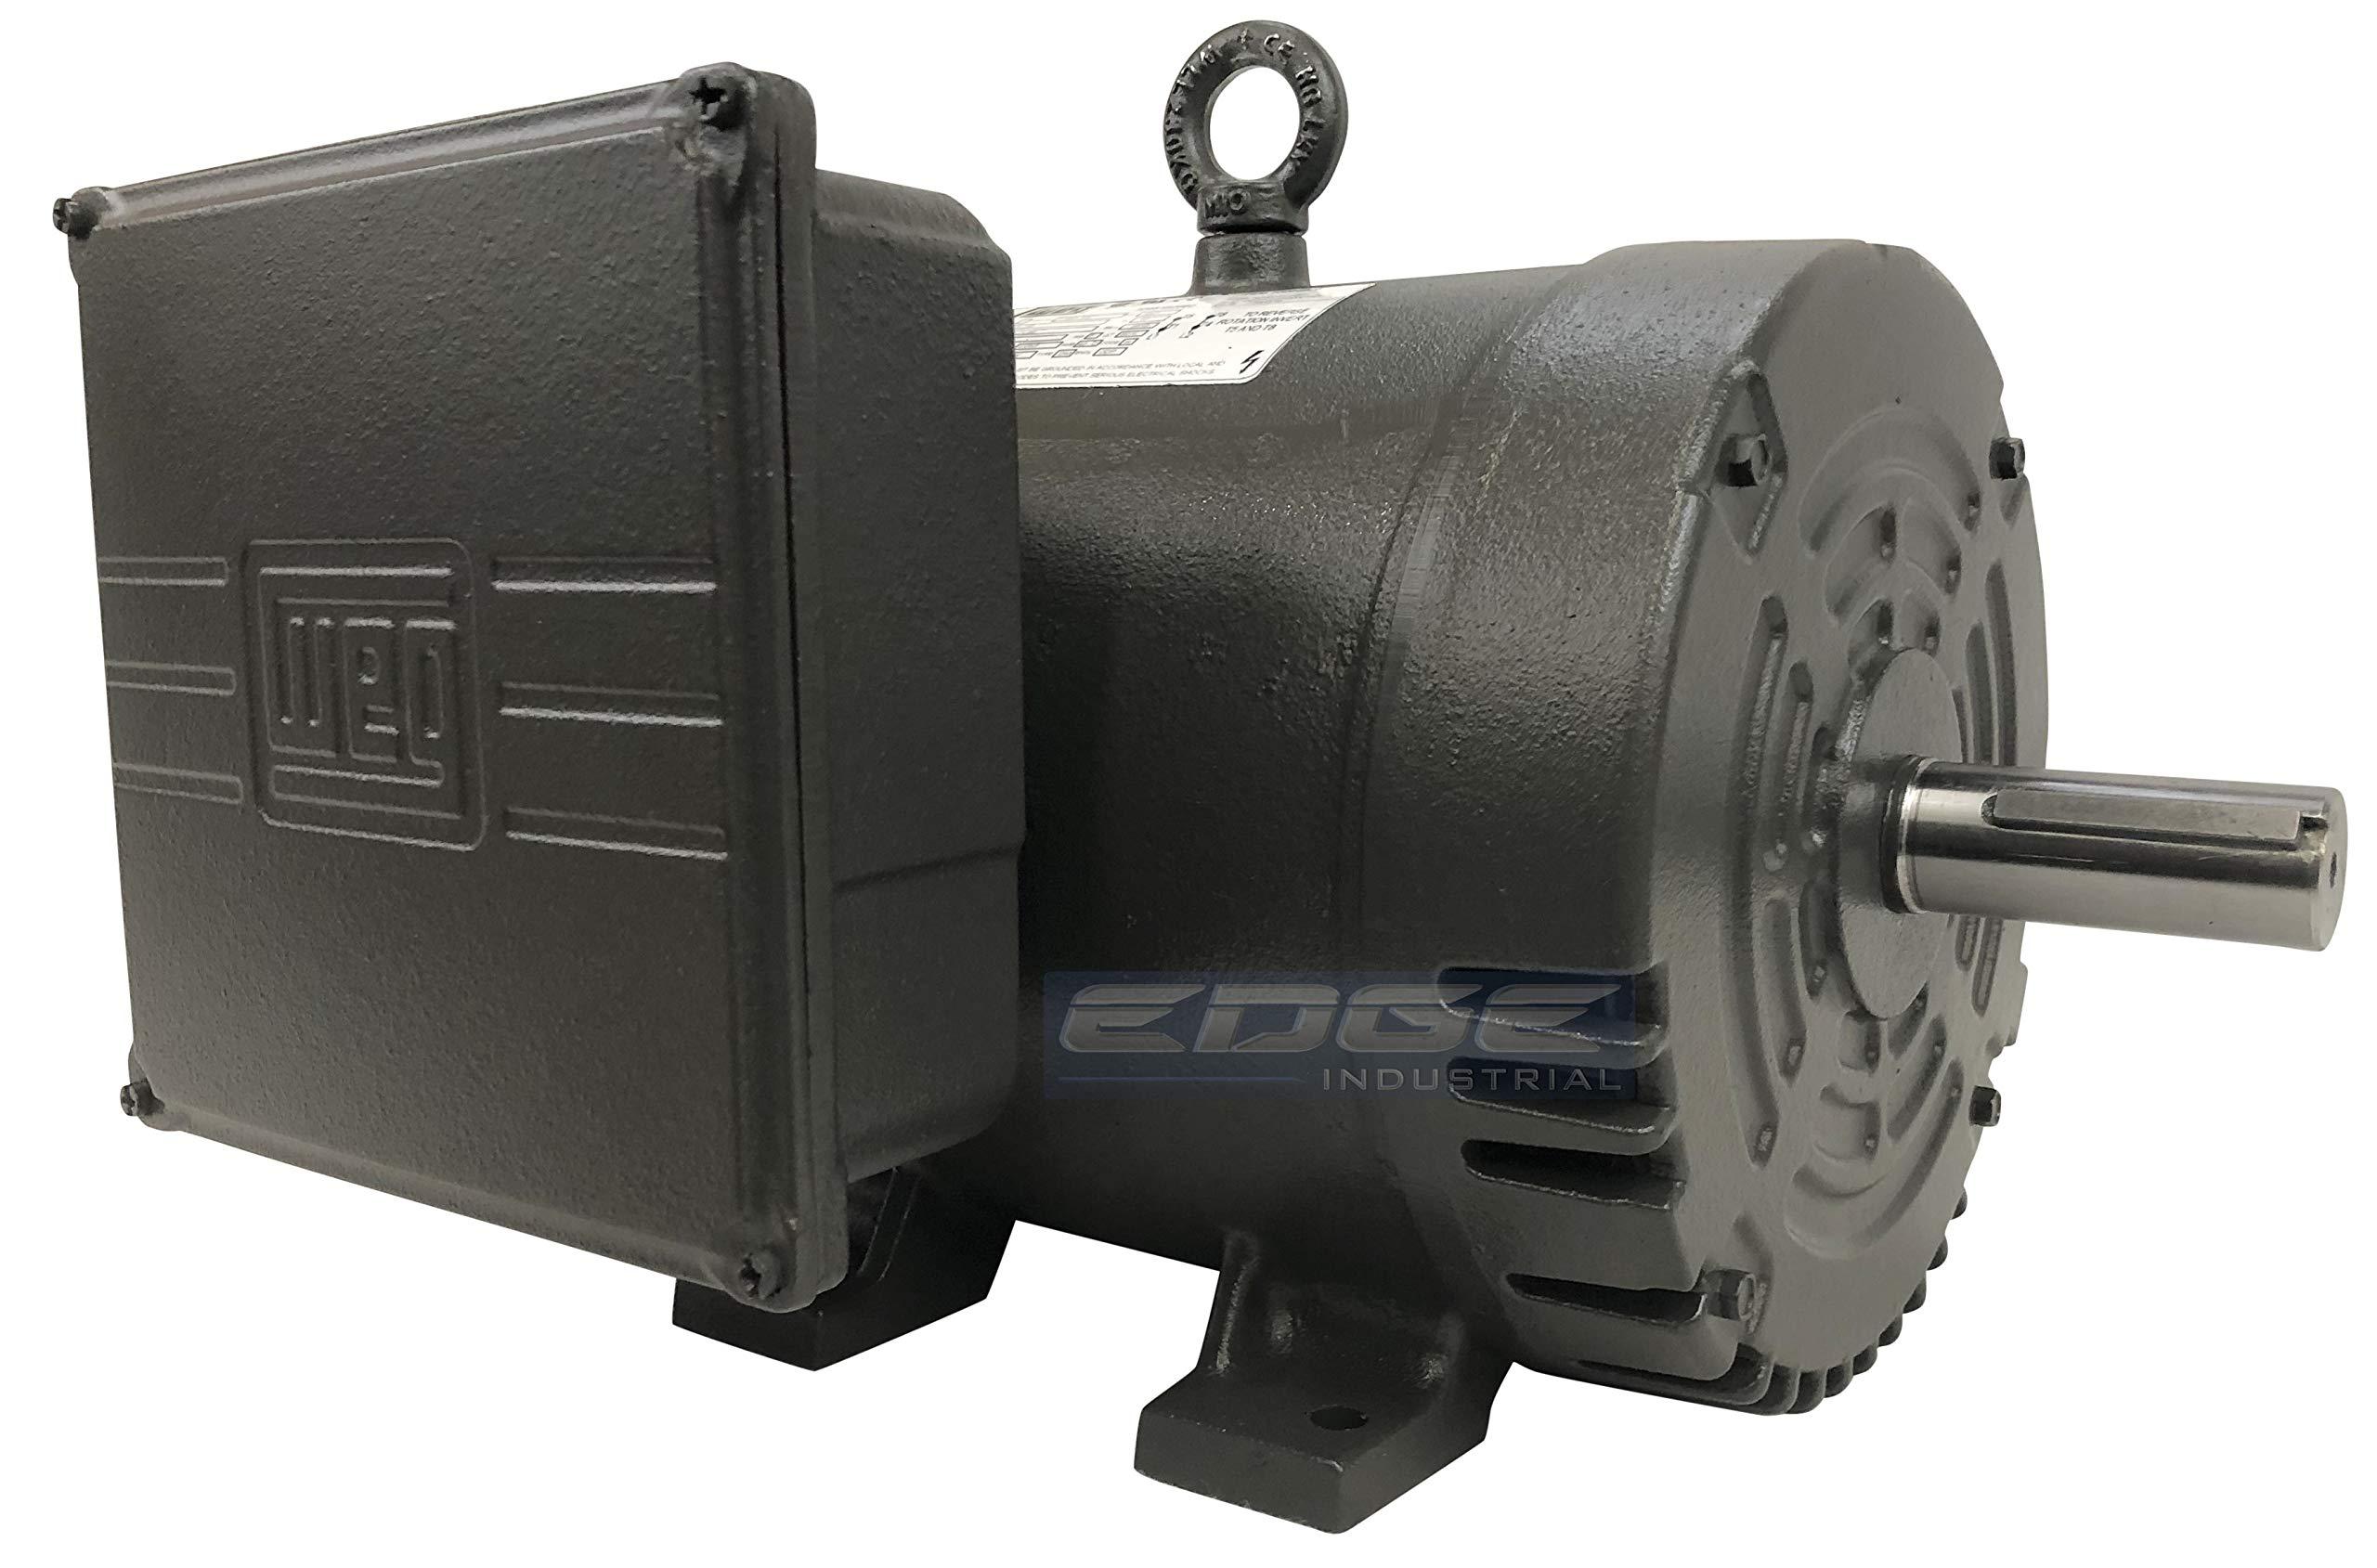 NEW WEG 7.5HP HEAVY DUTY AIR COMPRESSOR ELECTRIC MOTOR 3450 RPM, 1 PHASE, 184T FRAME, 230VOLT, CAST IRON FRAME